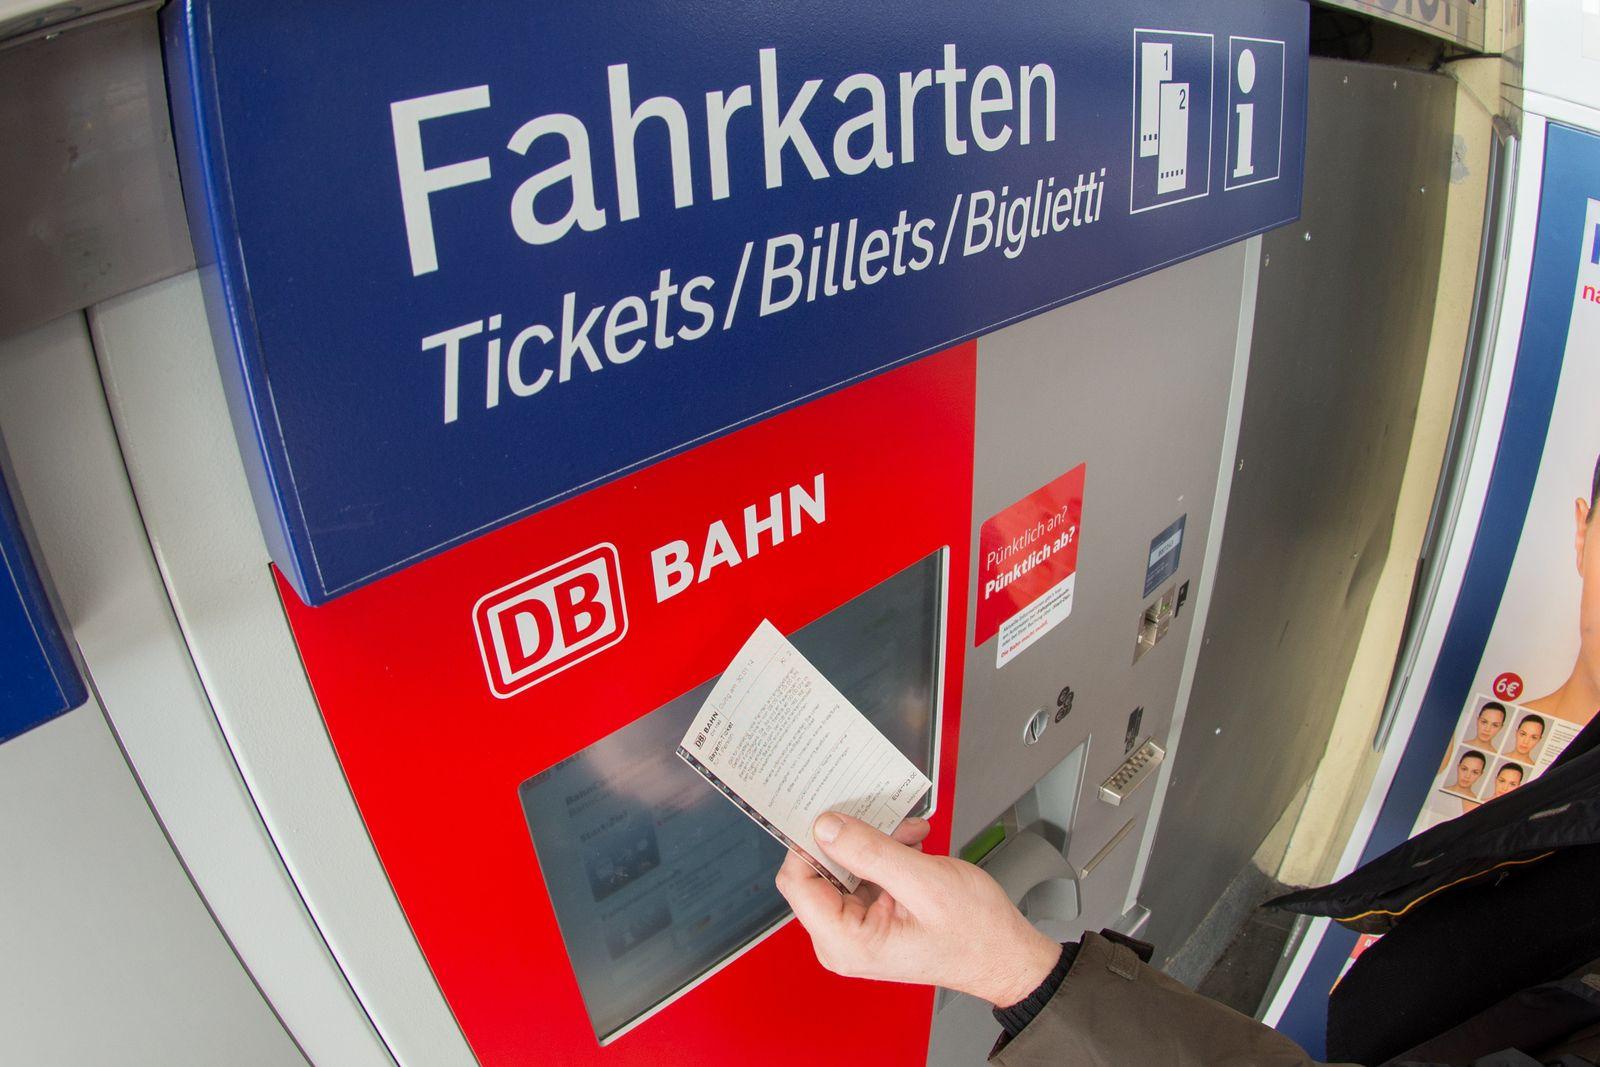 Fahrkarten/ Deutsche Bahn